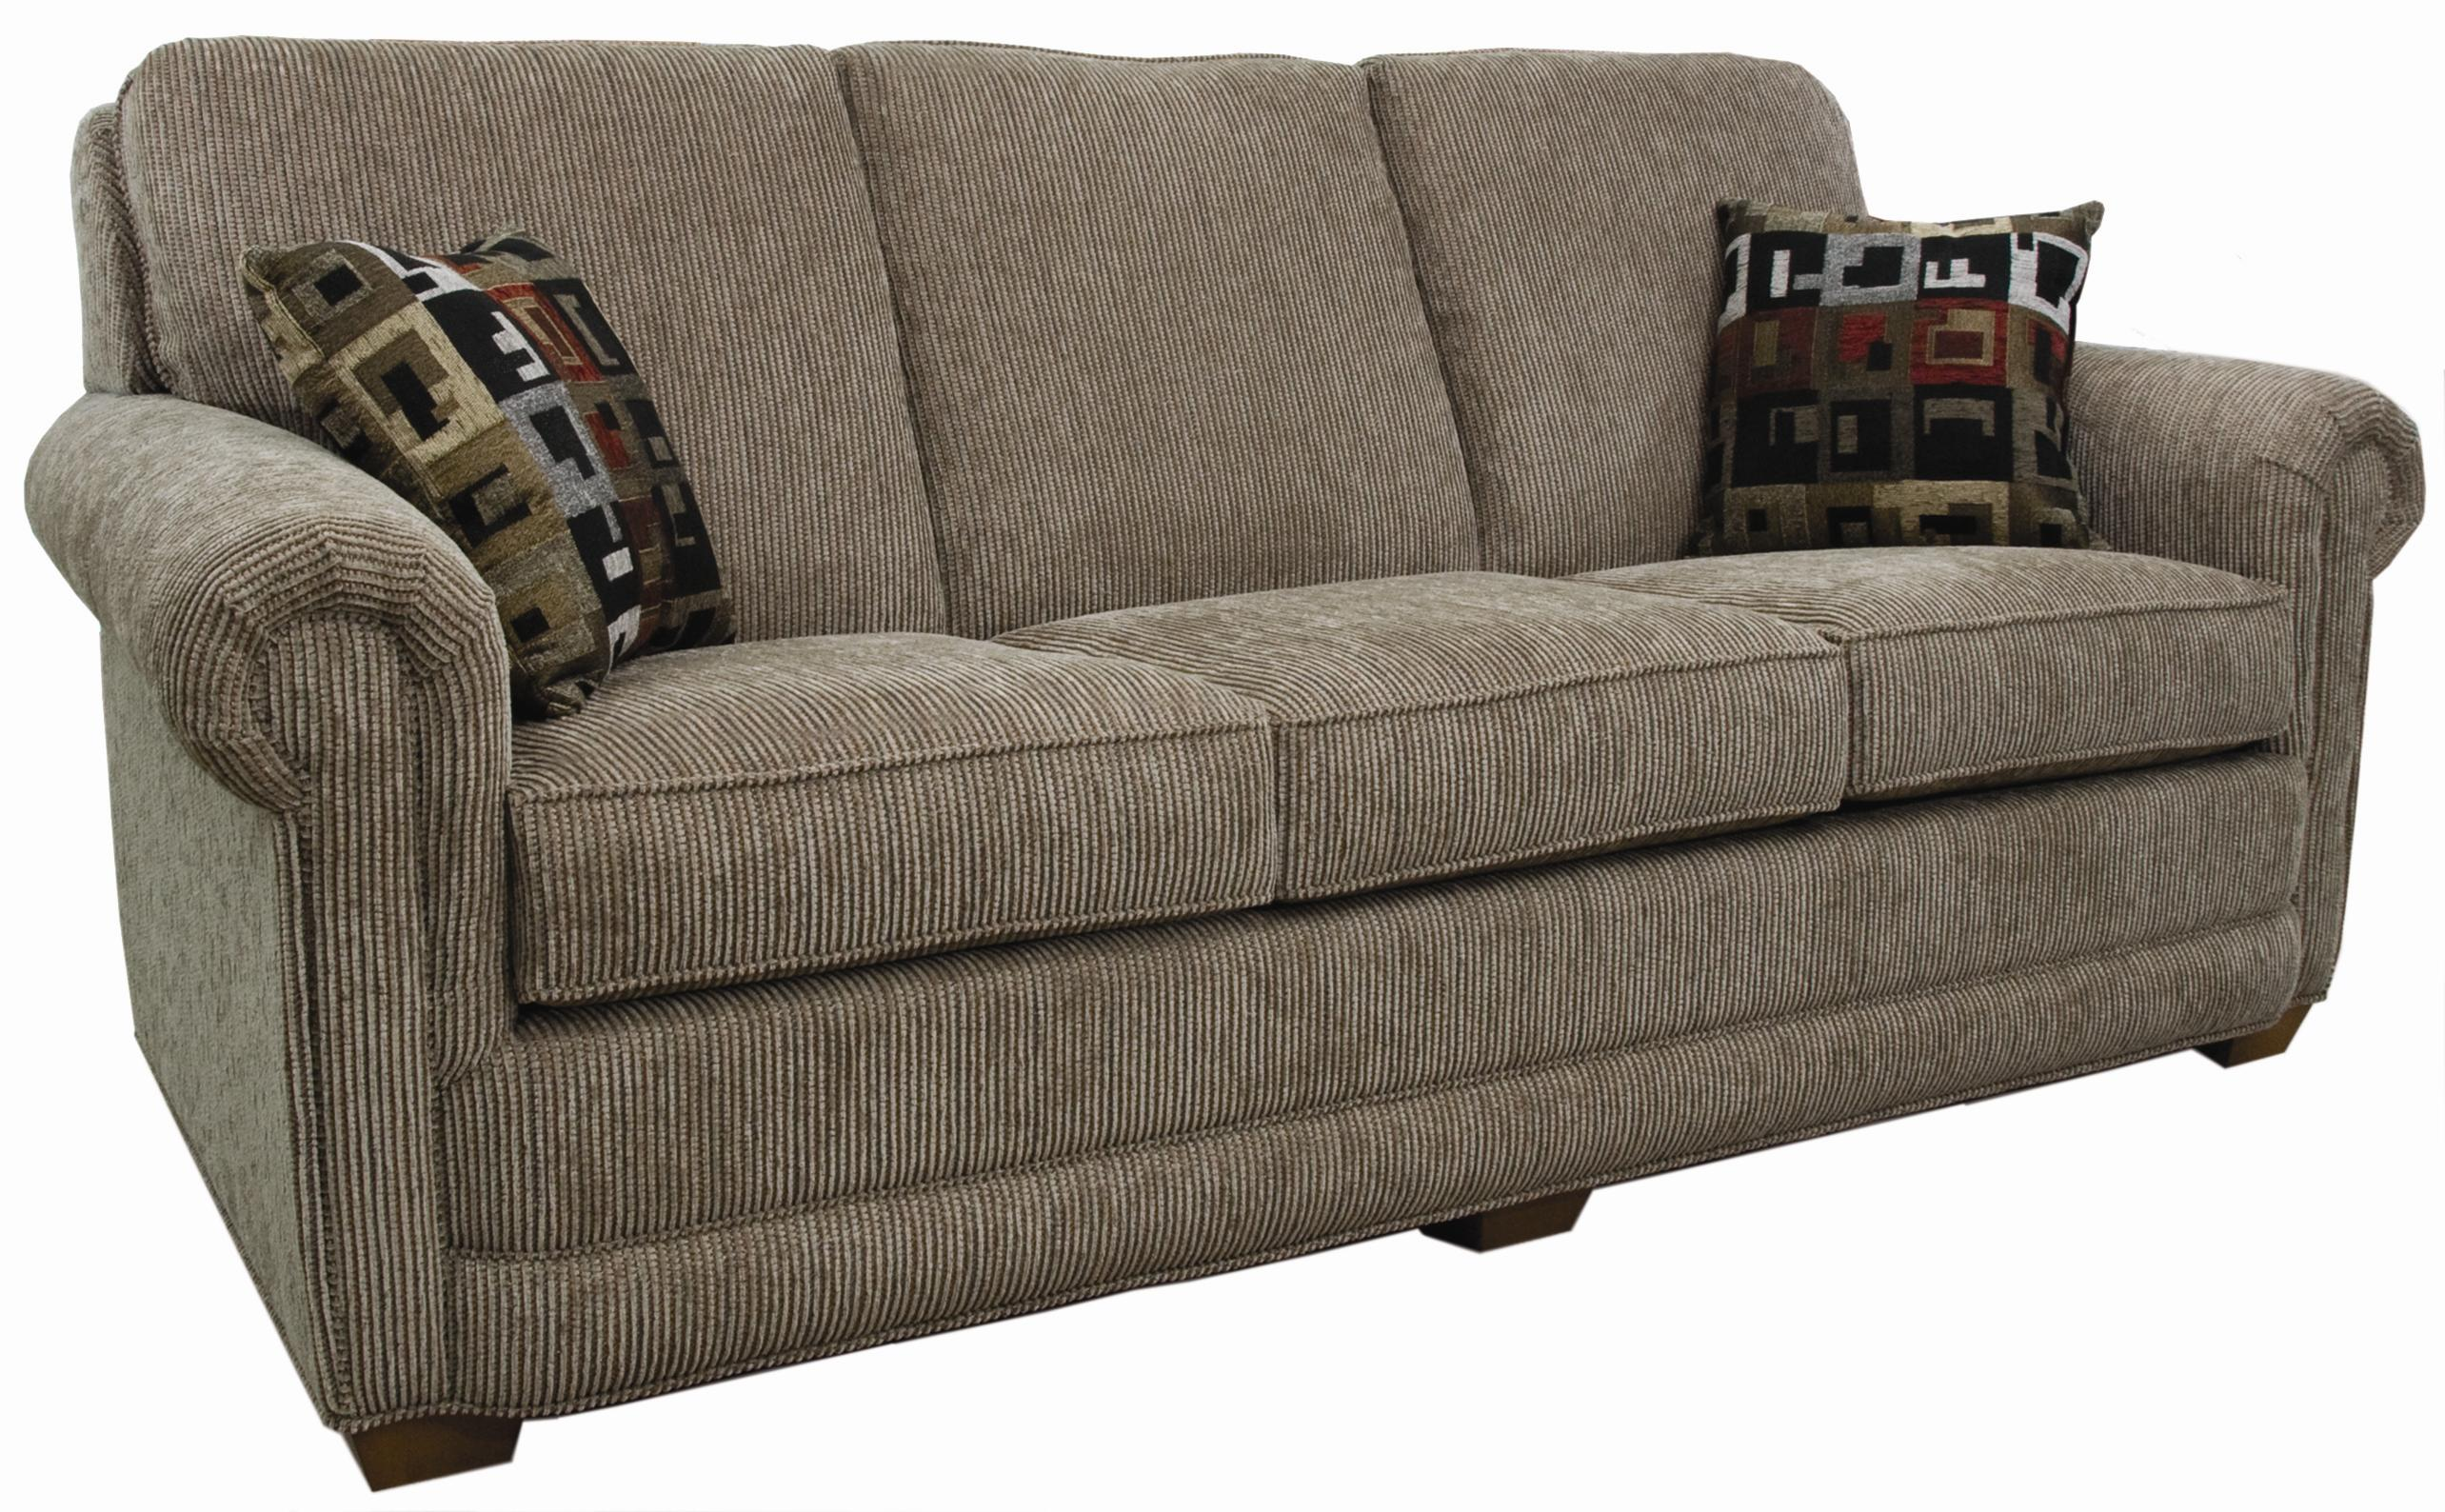 80 Sofa by Lancer at Westrich Furniture & Appliances